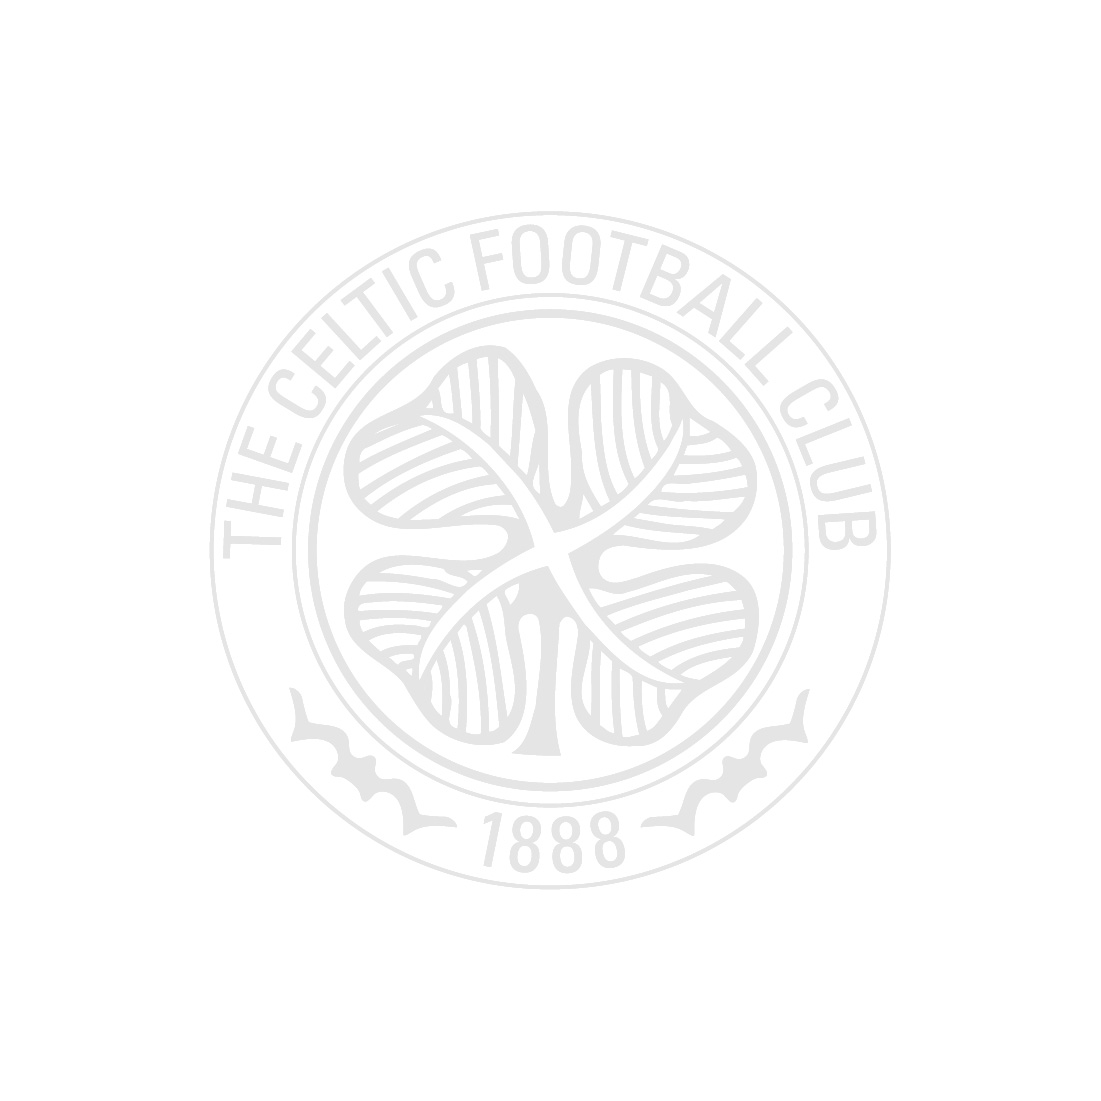 Celtic Season Ticket and Card Holder